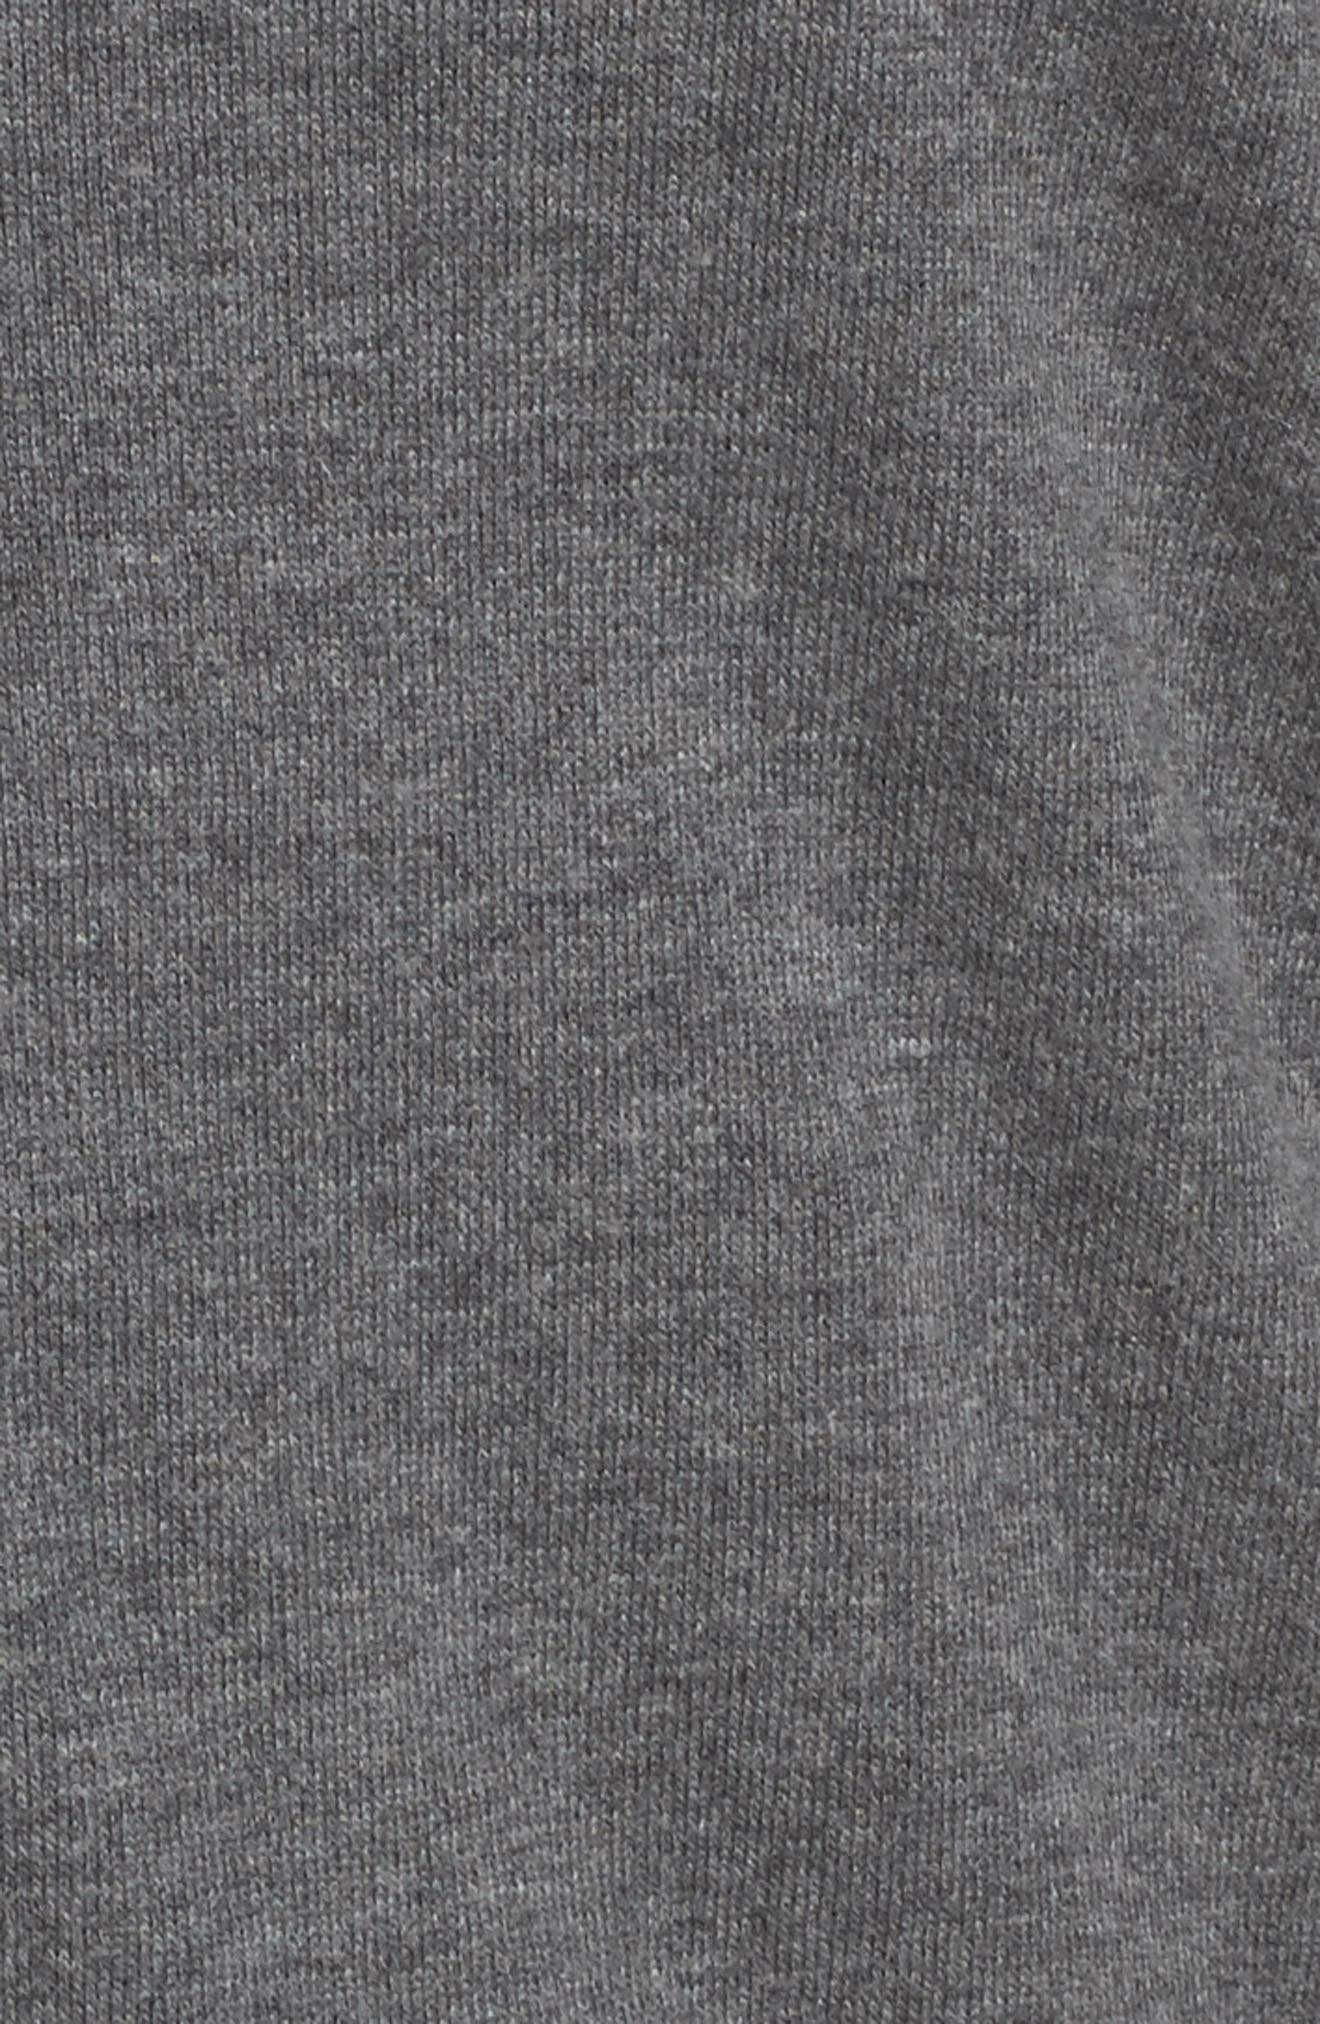 Dolman Sleeve Sweater,                             Alternate thumbnail 14, color,